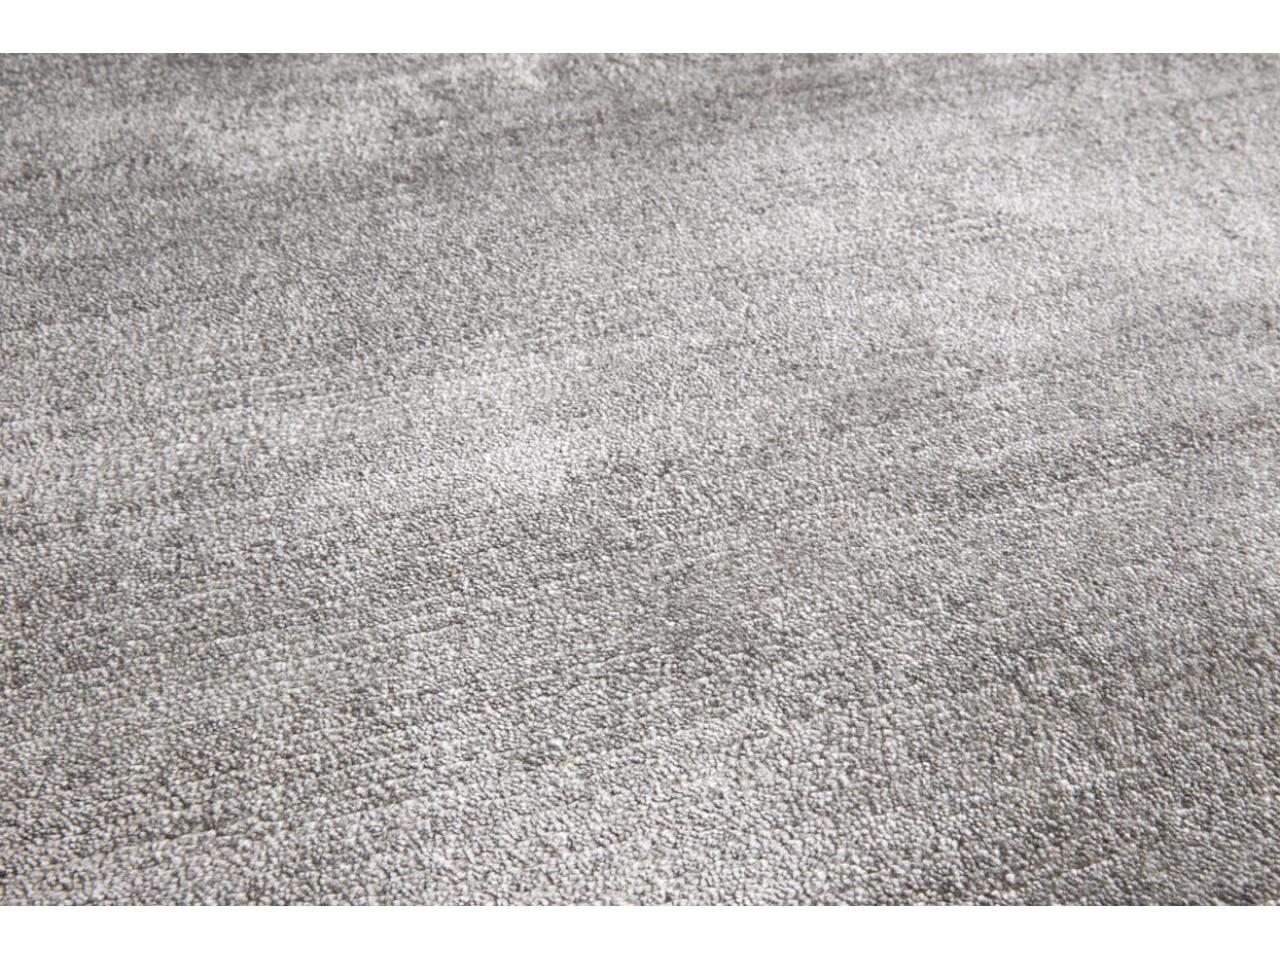 gris clair tapis unis n 27308 300x200cm. Black Bedroom Furniture Sets. Home Design Ideas